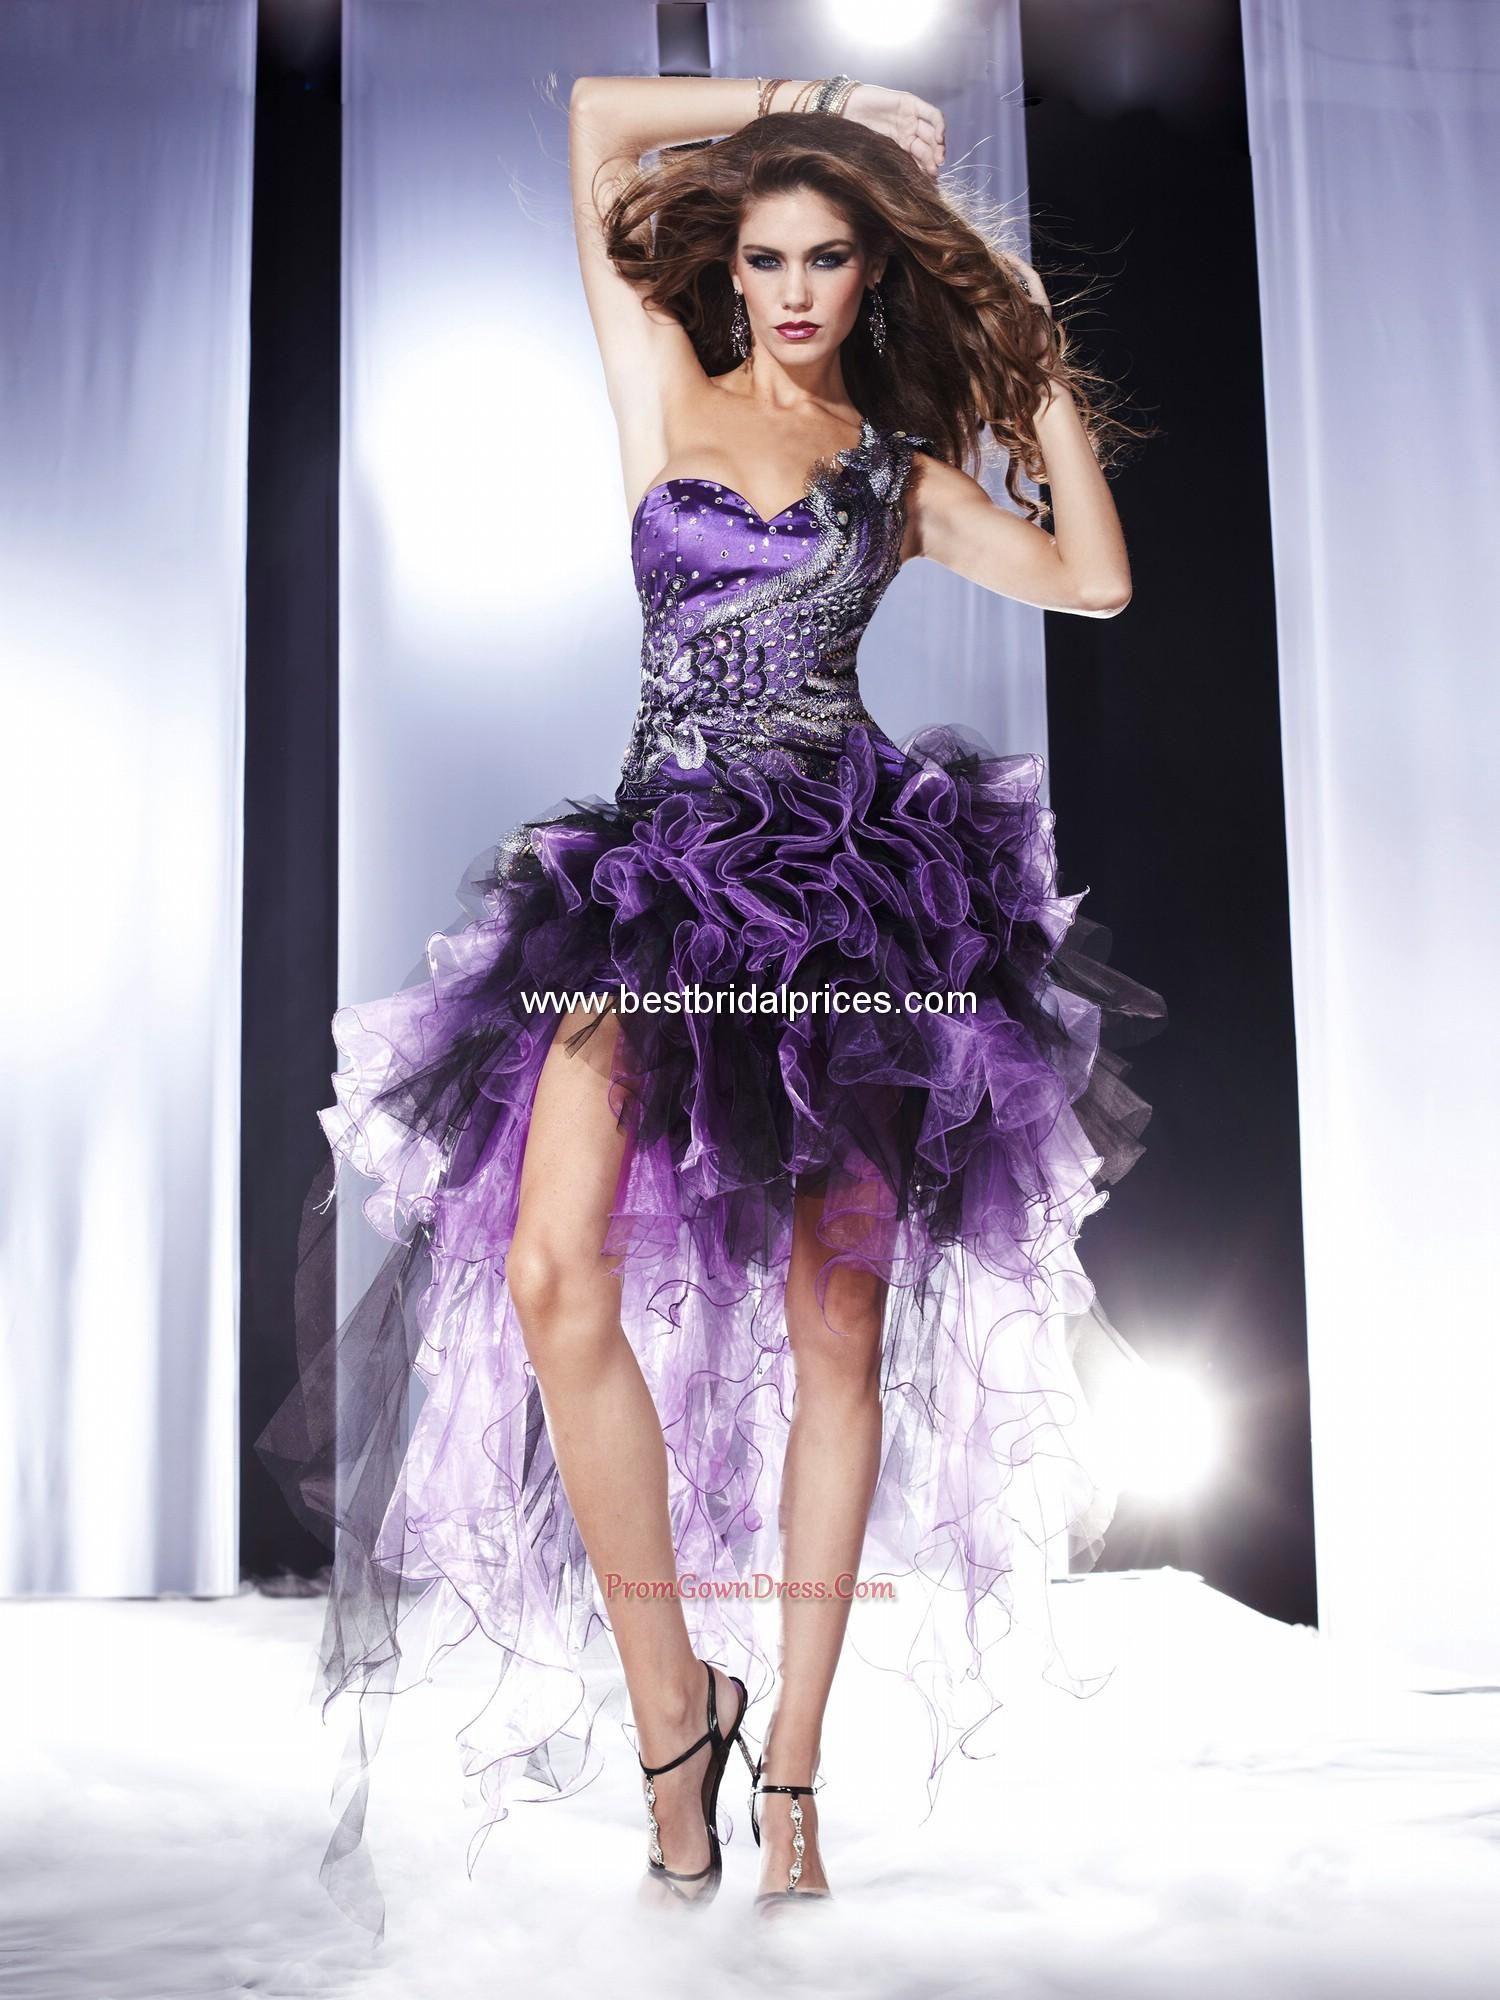 Gorgeous purple one shoulder short prom homecoming dressdark purple